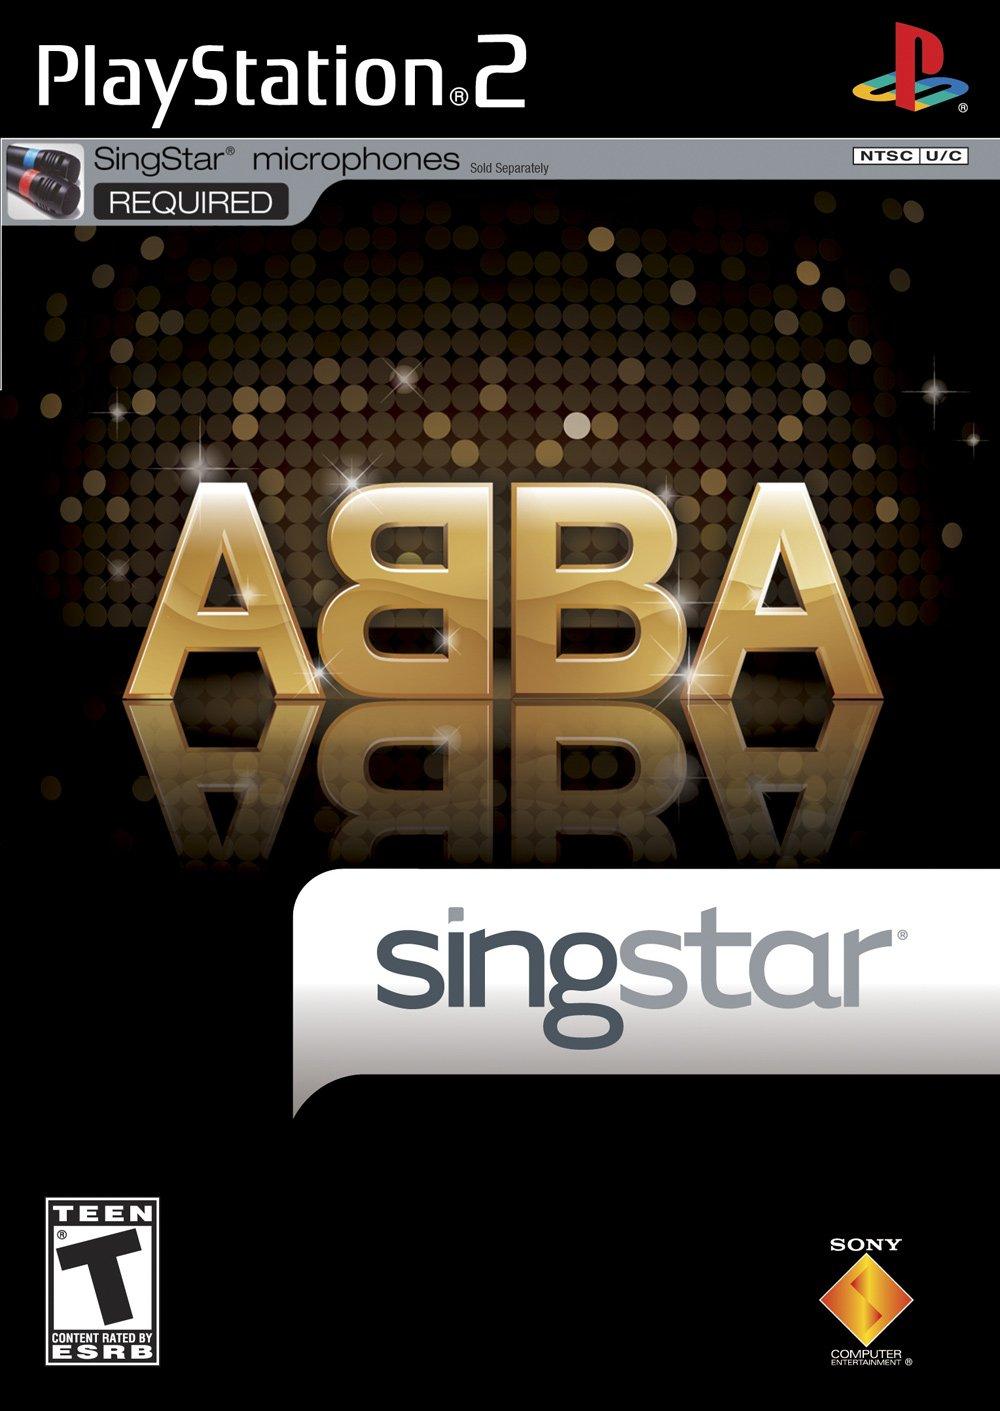 Singstar ABBA (Playstation 2) - USED